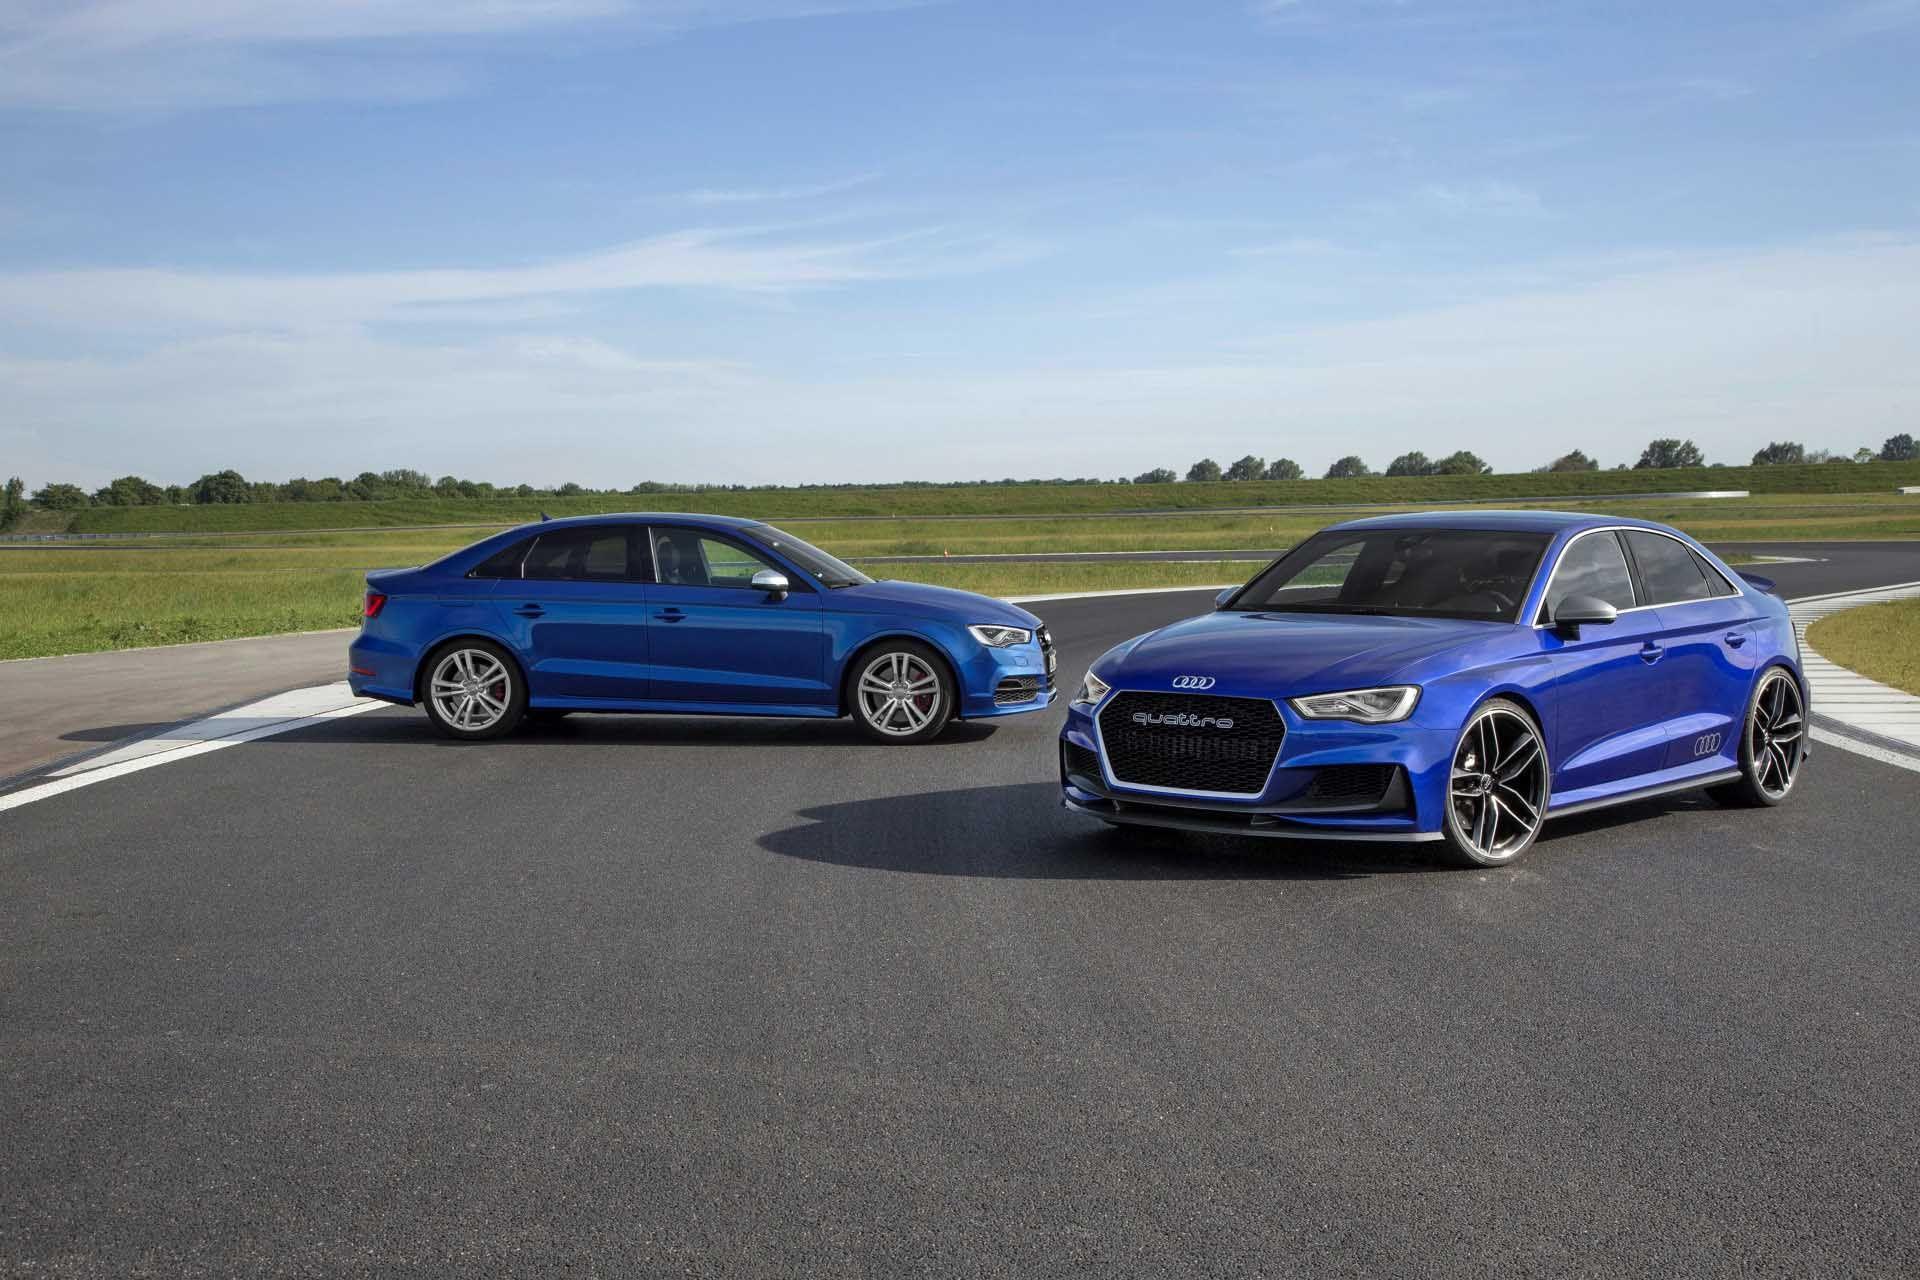 10 Spectacular Audi S3 Sedan High Quality Image Audi